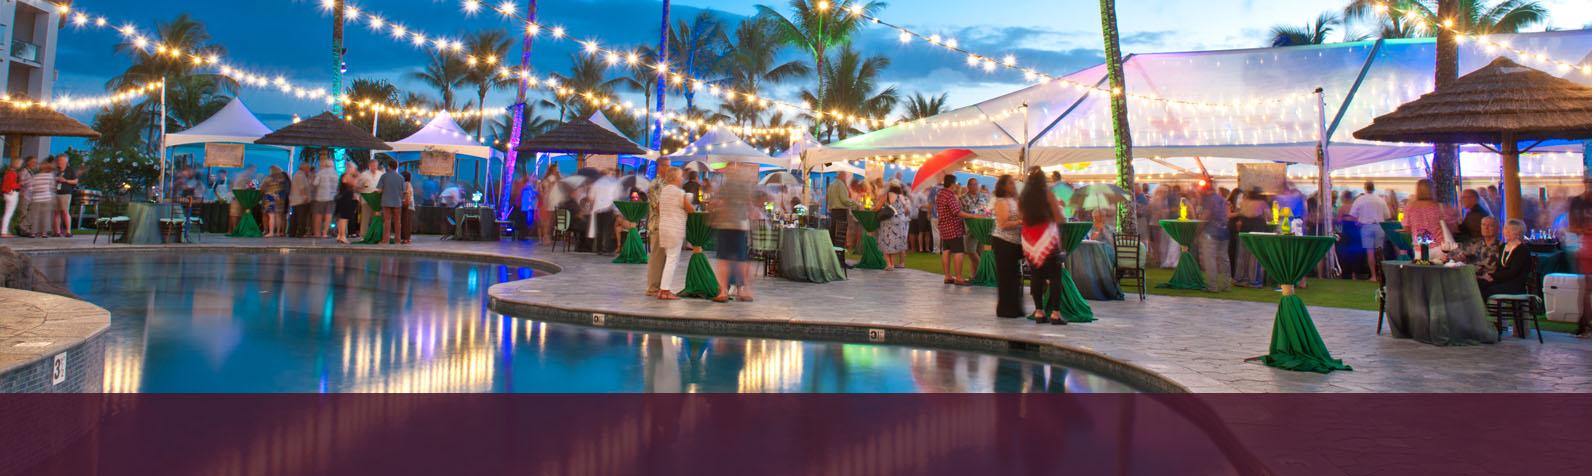 Kapalua Wine & Food Festival 2014 Events